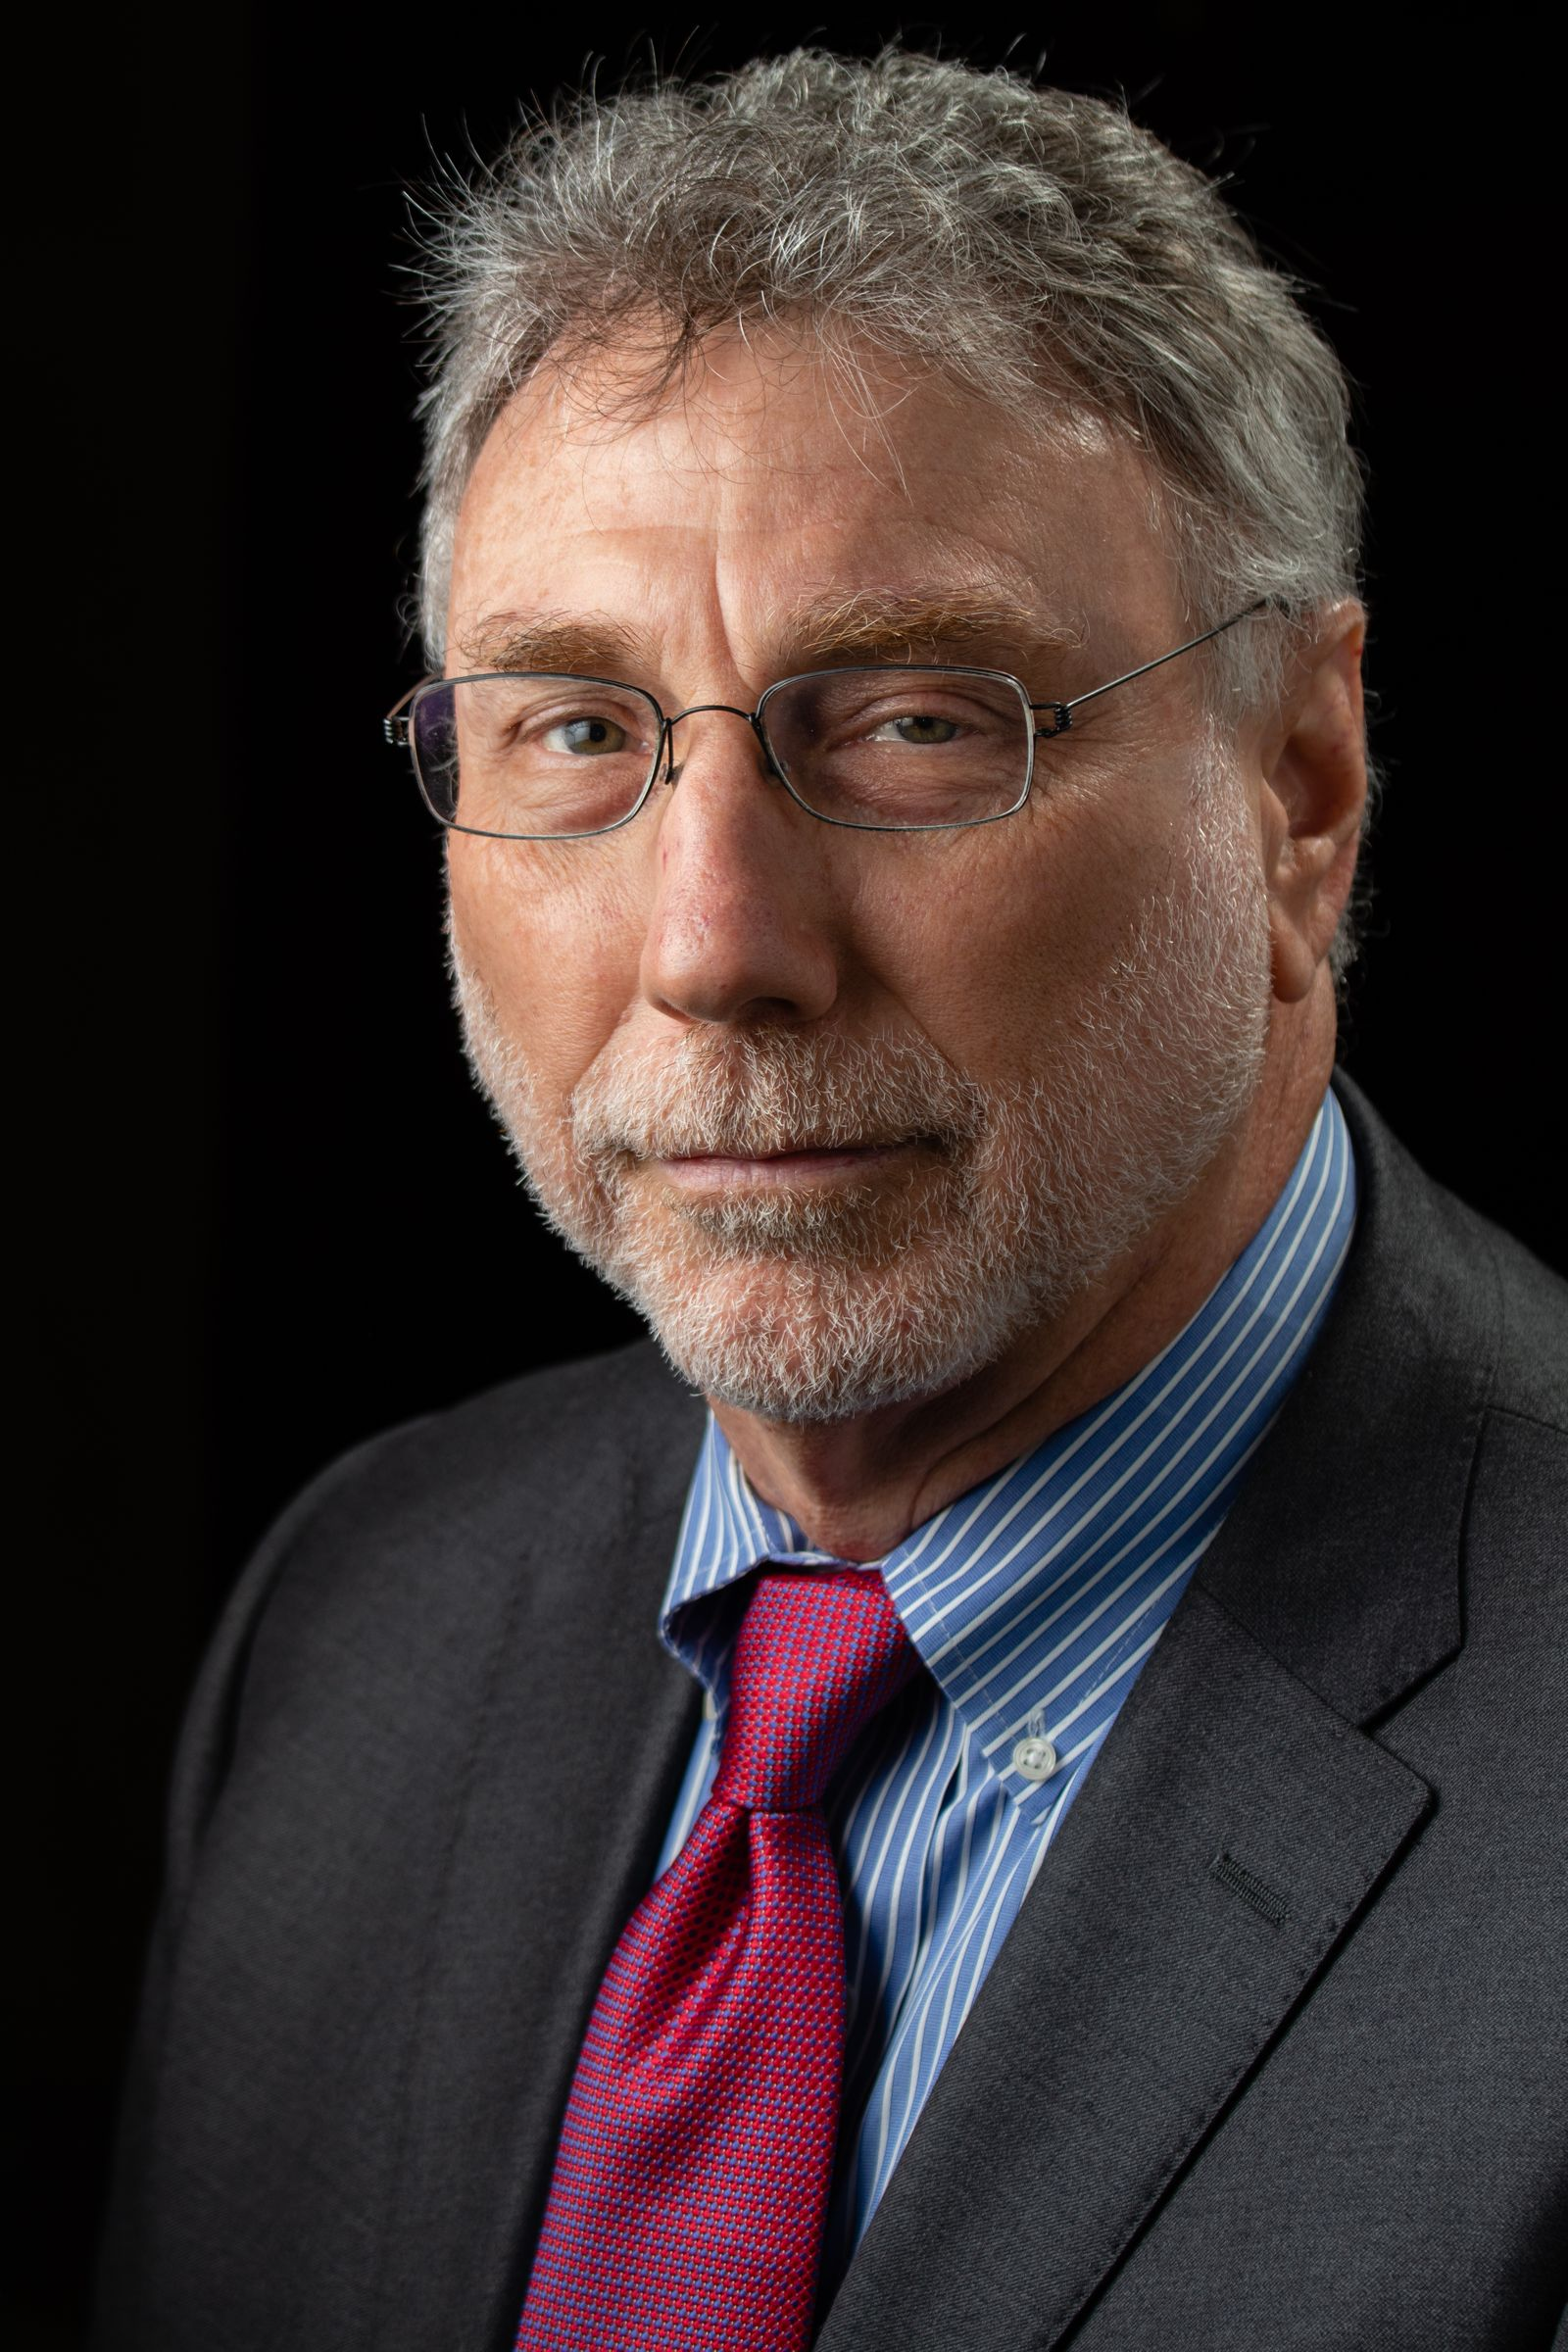 Pulitzer2018-marty-baron-20180530-wp